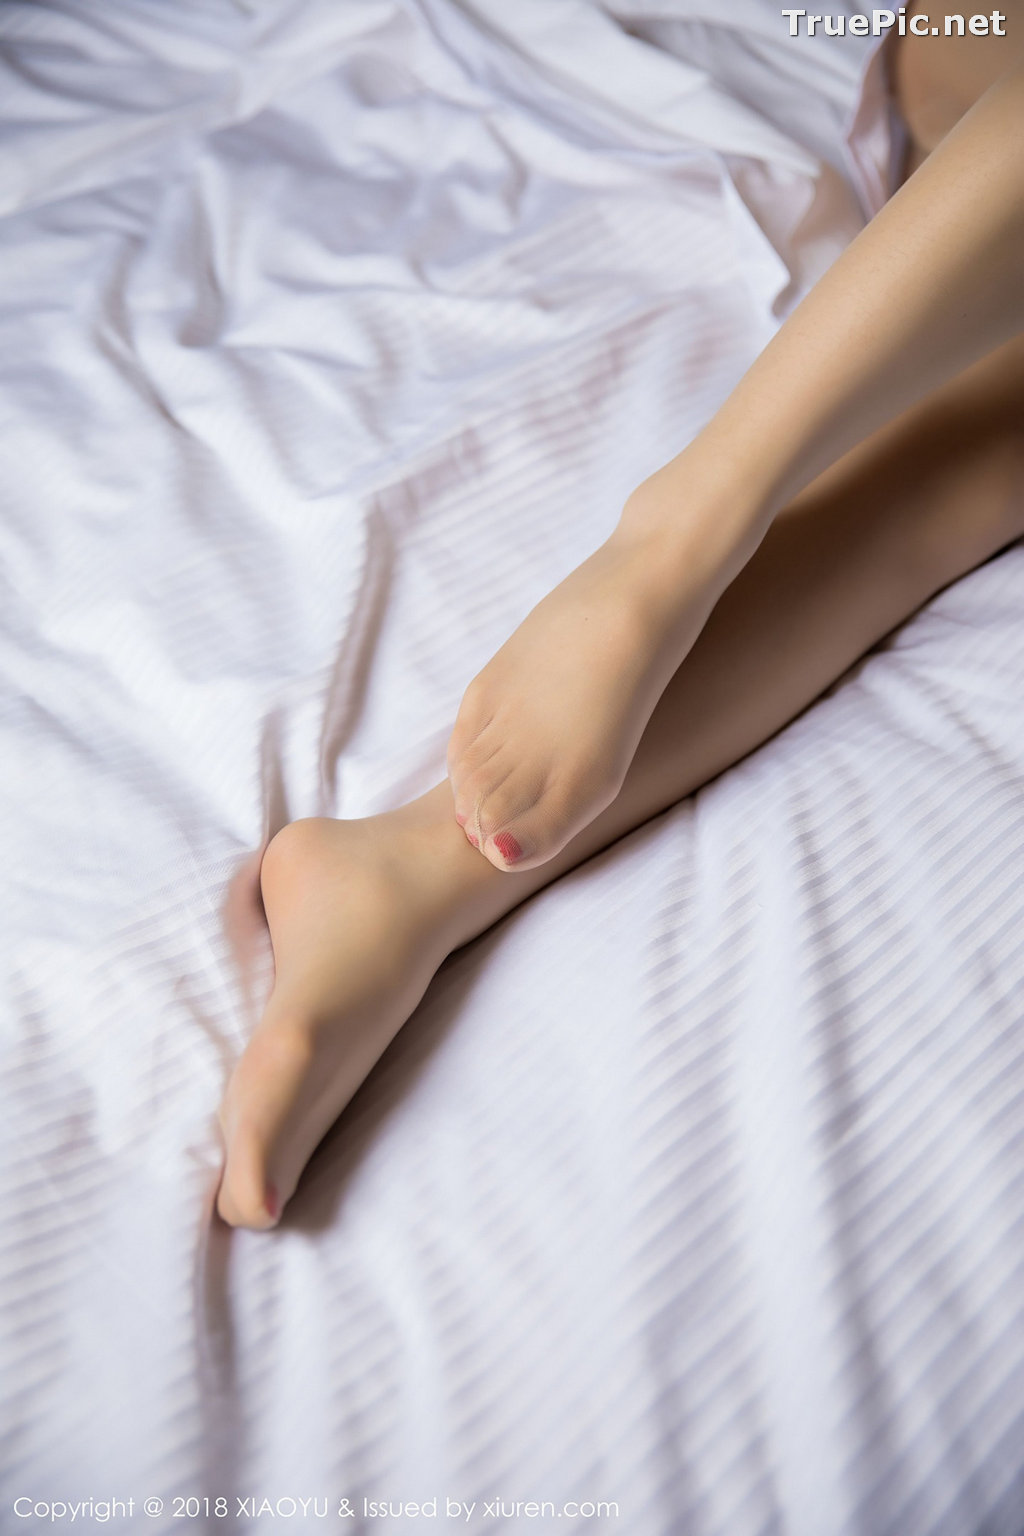 Image XiaoYu No.004 - Chinese Model - Xiao Reba (Angela喜欢猫) - White Sexy Nurse - TruePic.net - Picture-56